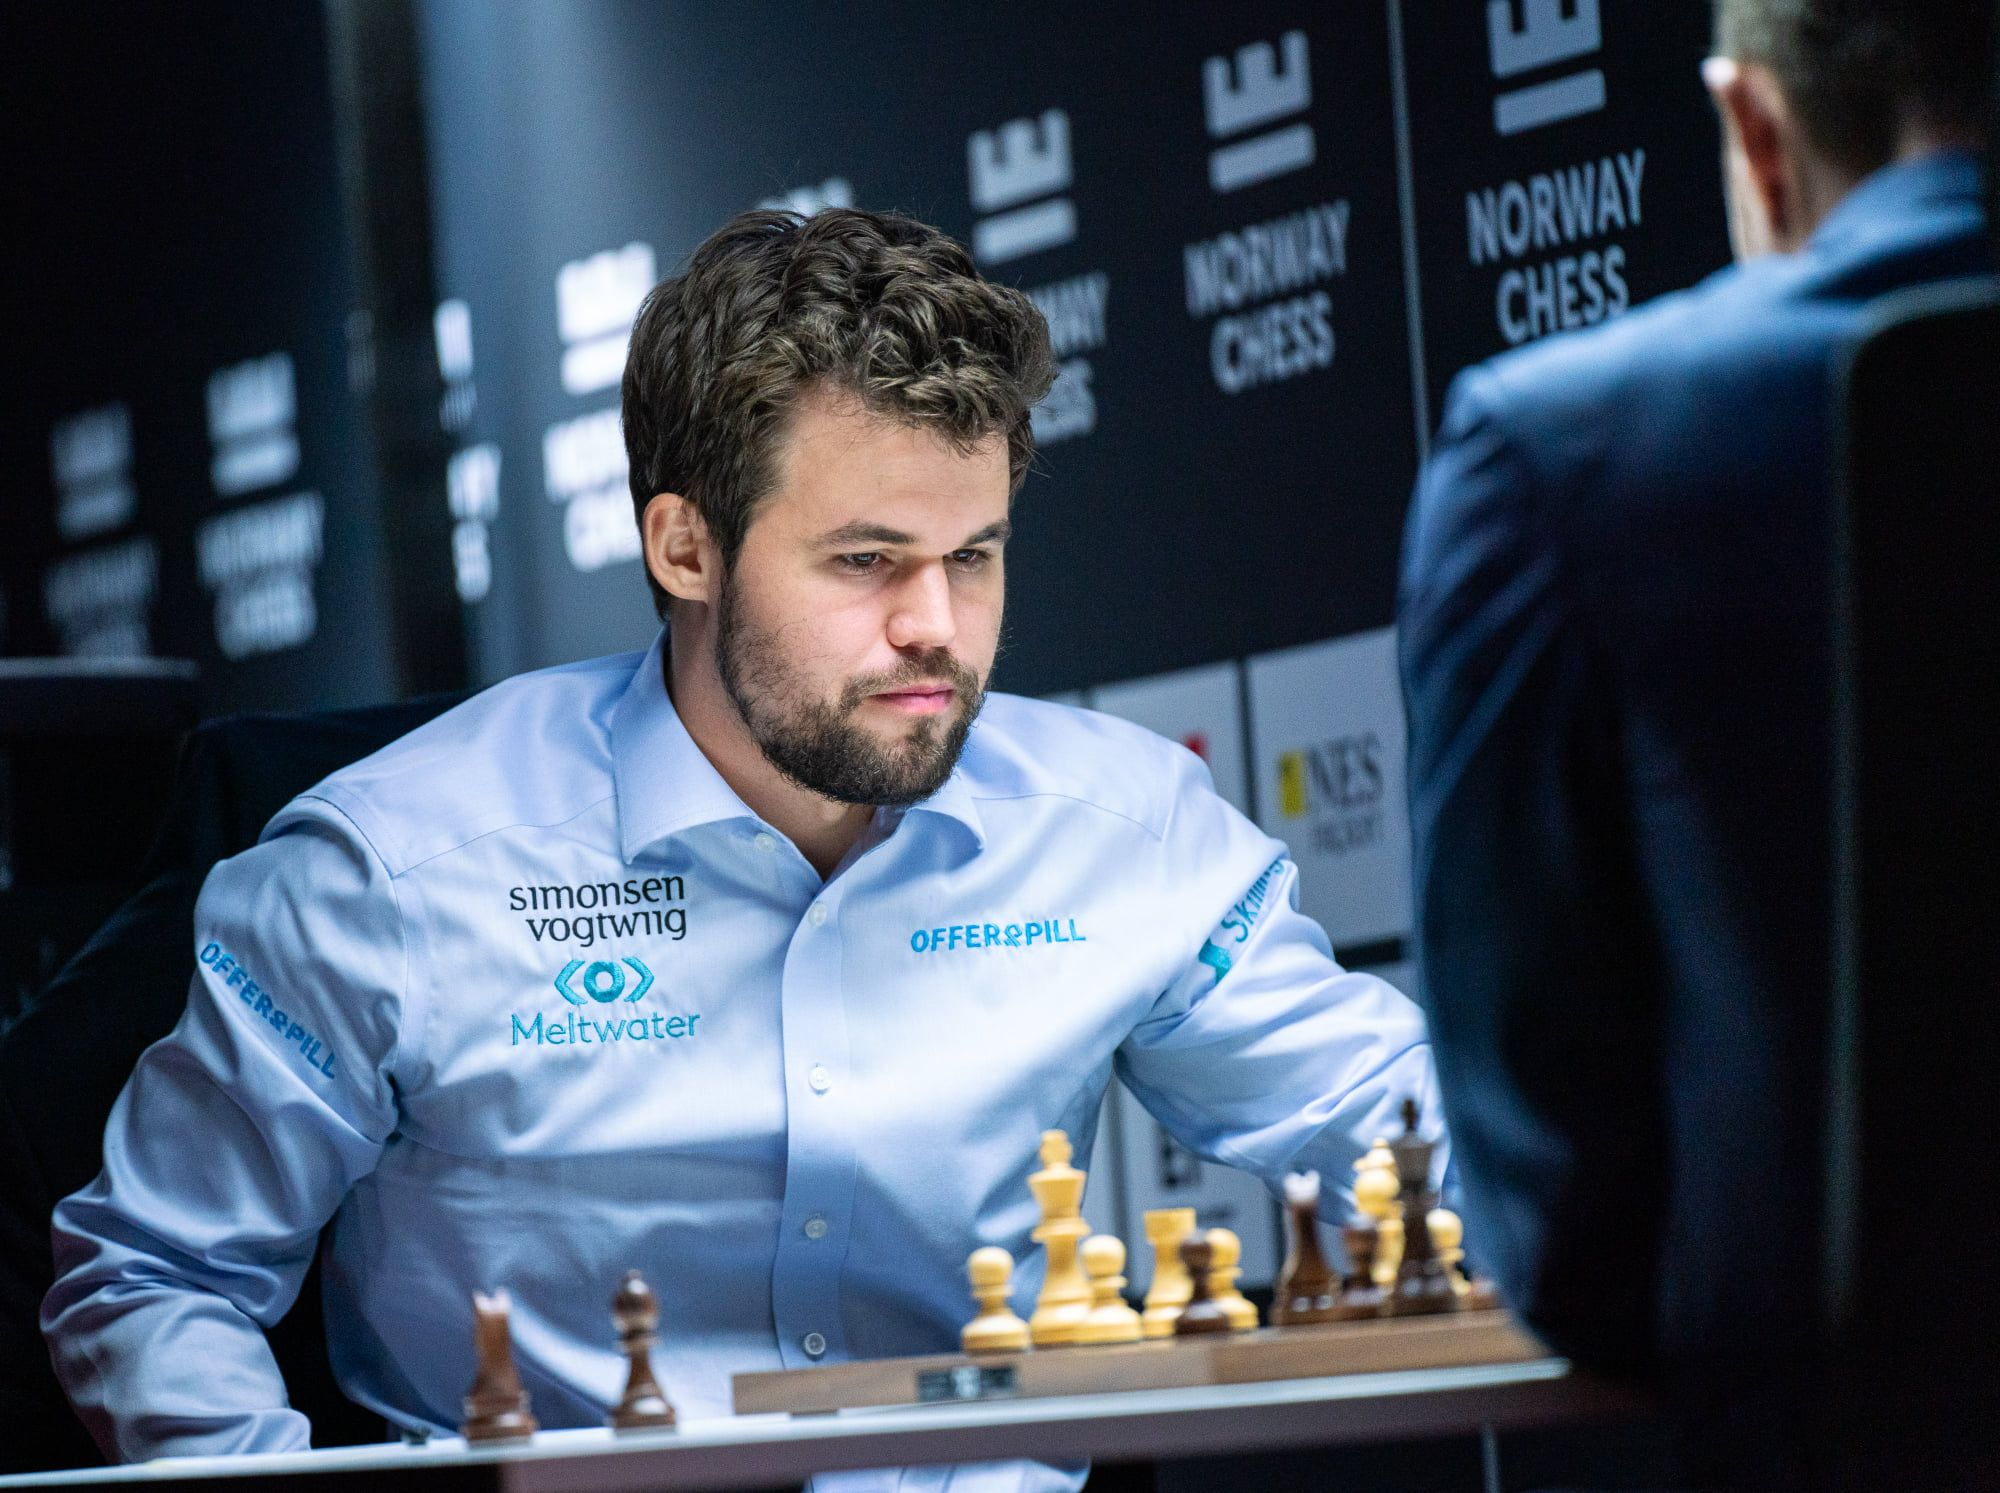 Carlsen Karjakin 2021 Noruega Xadrez